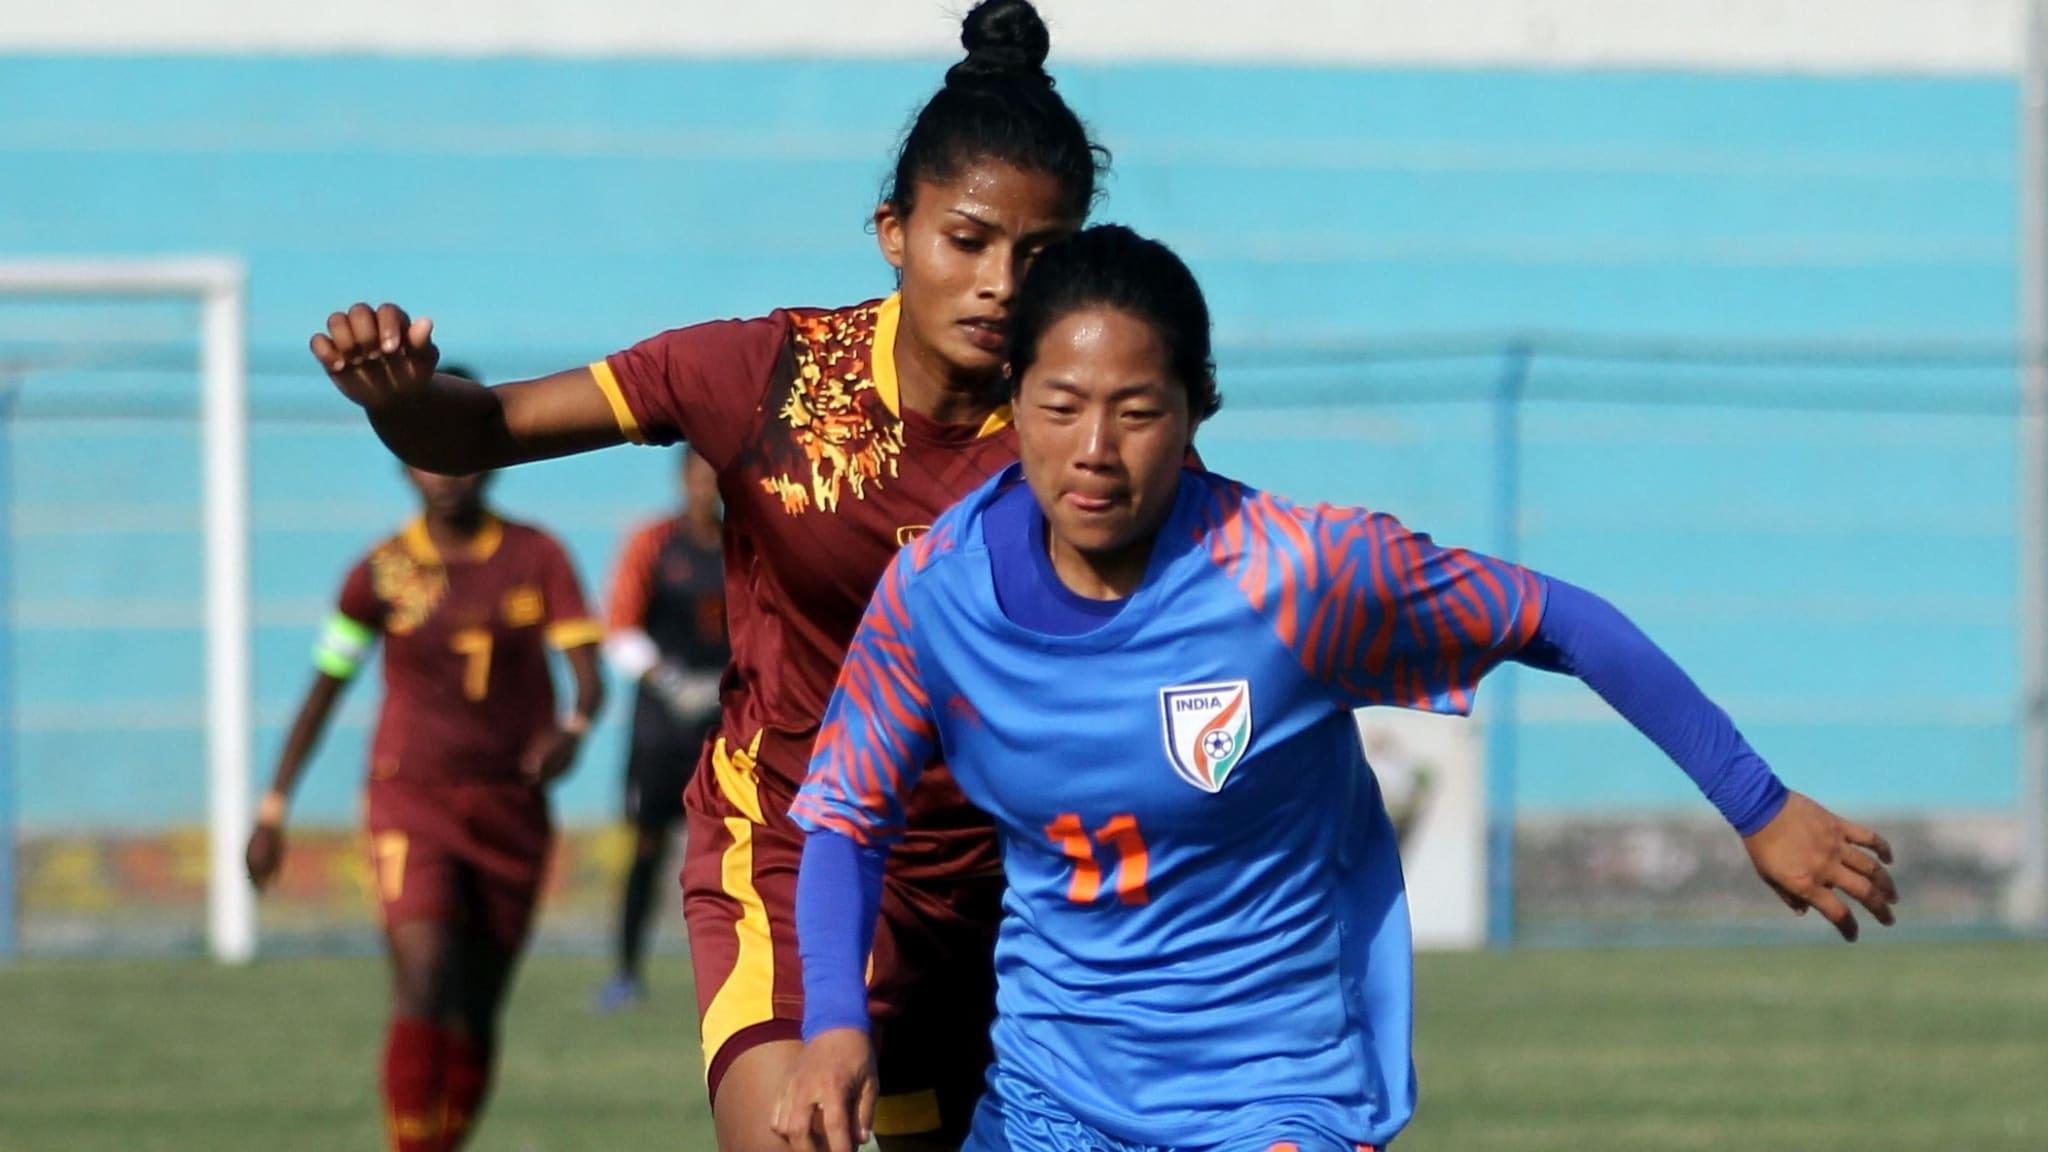 India forward Dangmei Grace runs with the ball